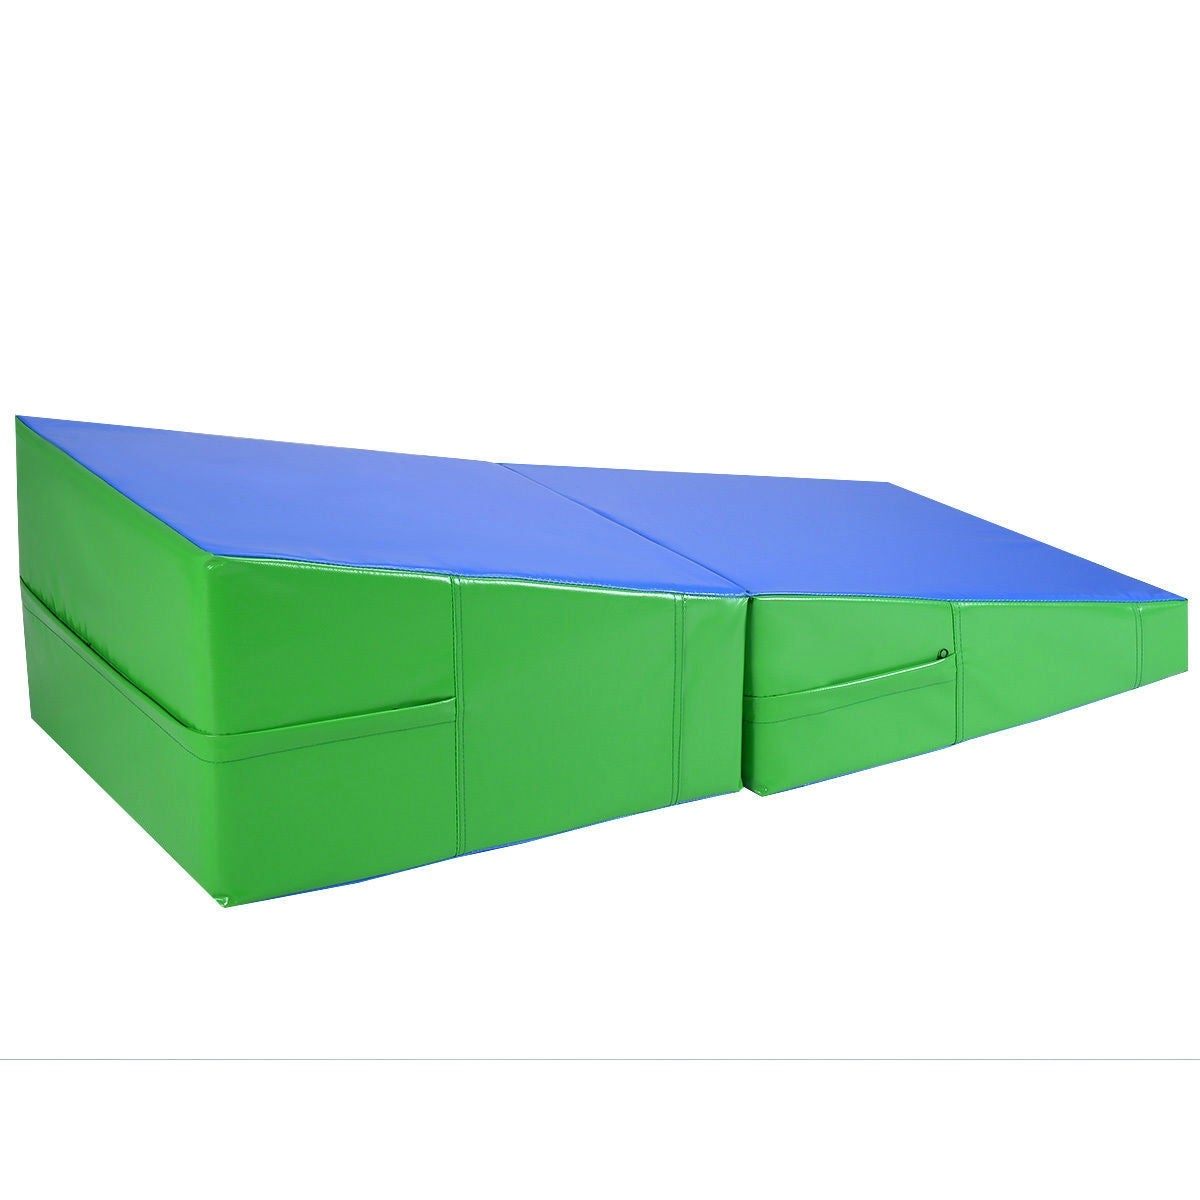 x standard products mats inc mat jumbo athletic norbert s gymnastics incline folding zoom